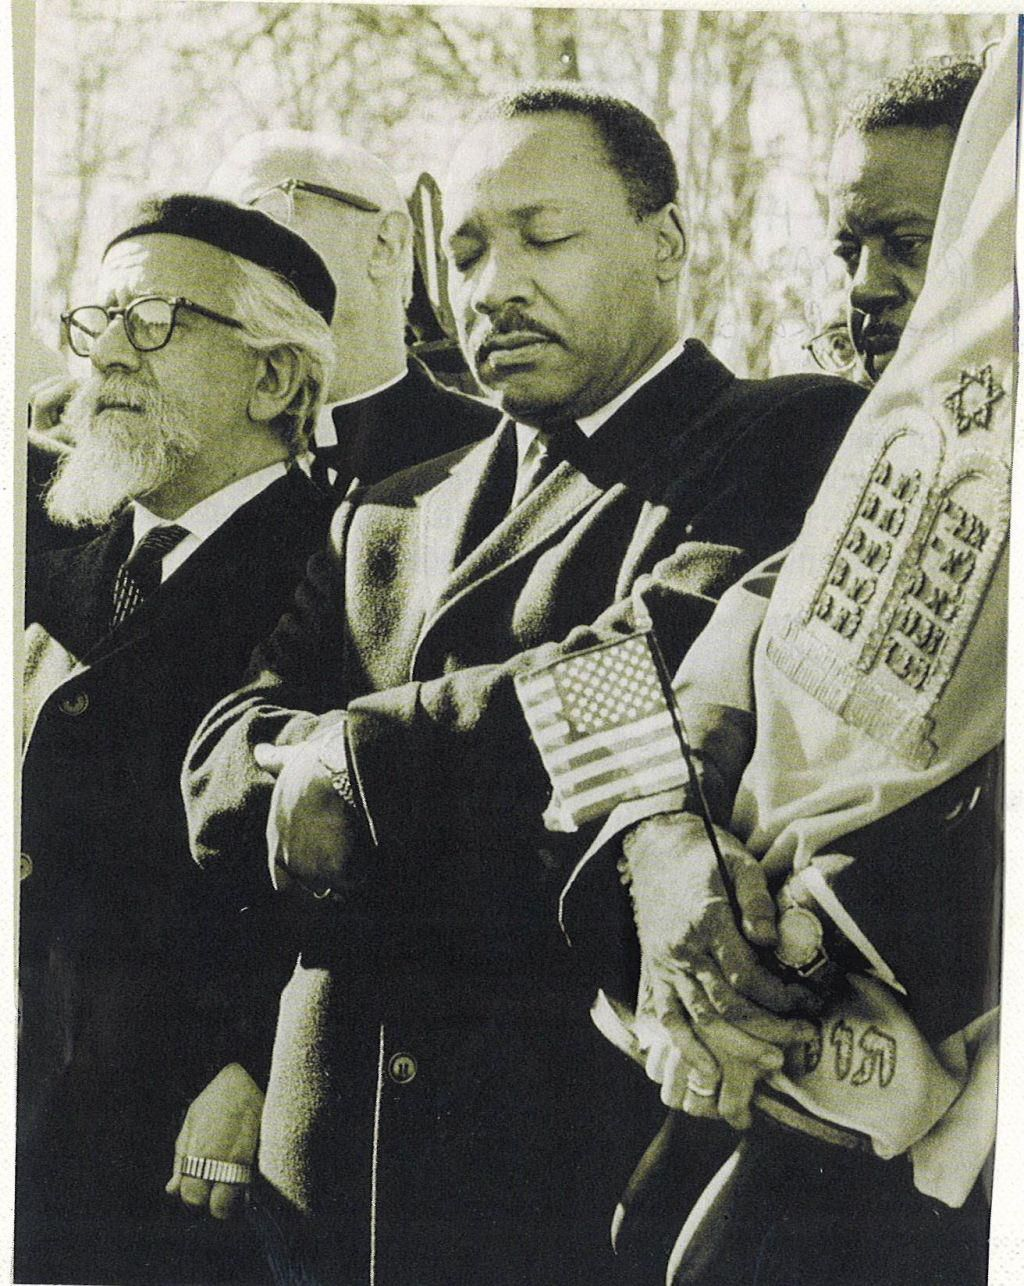 martin luther king & abraham joshua heschel